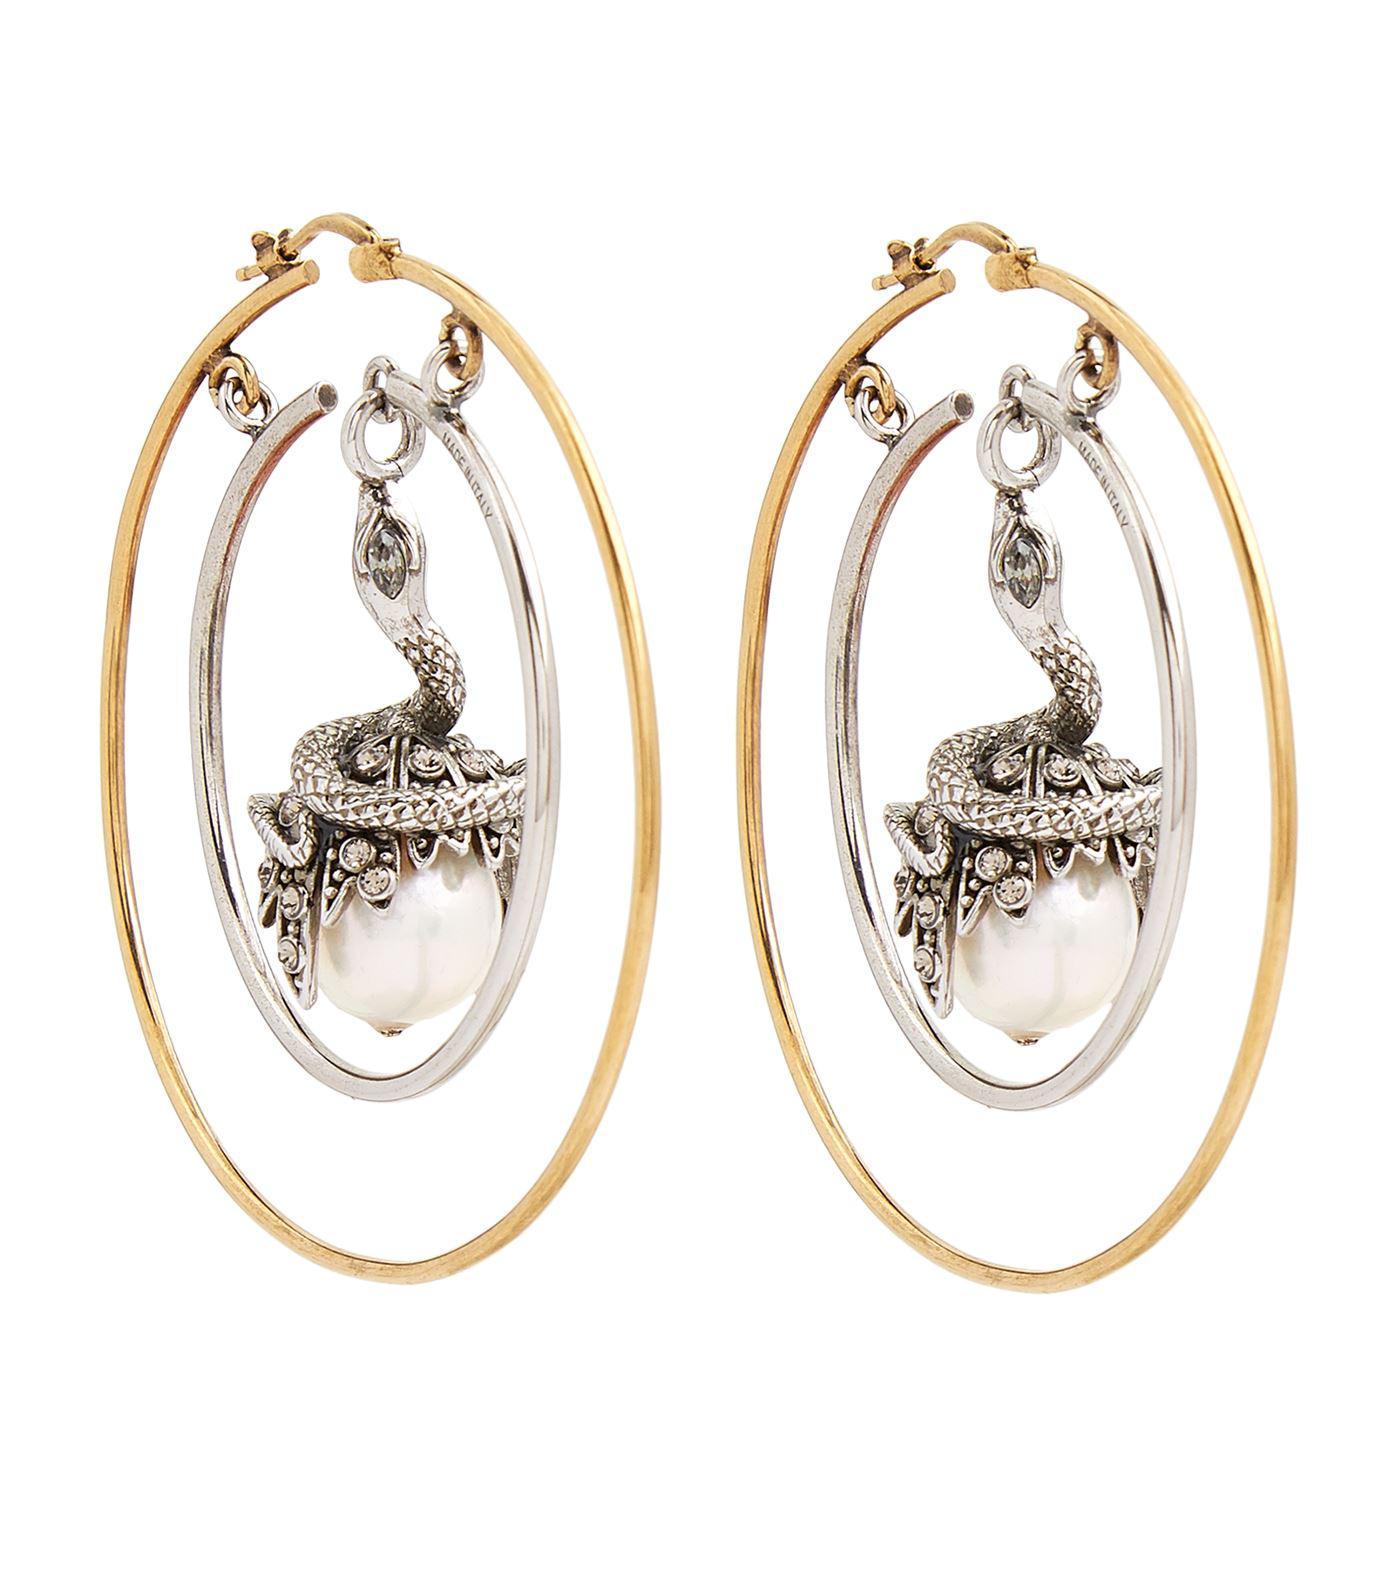 Faux-pearl drop hoop earrings Alexander McQueen d1sC3